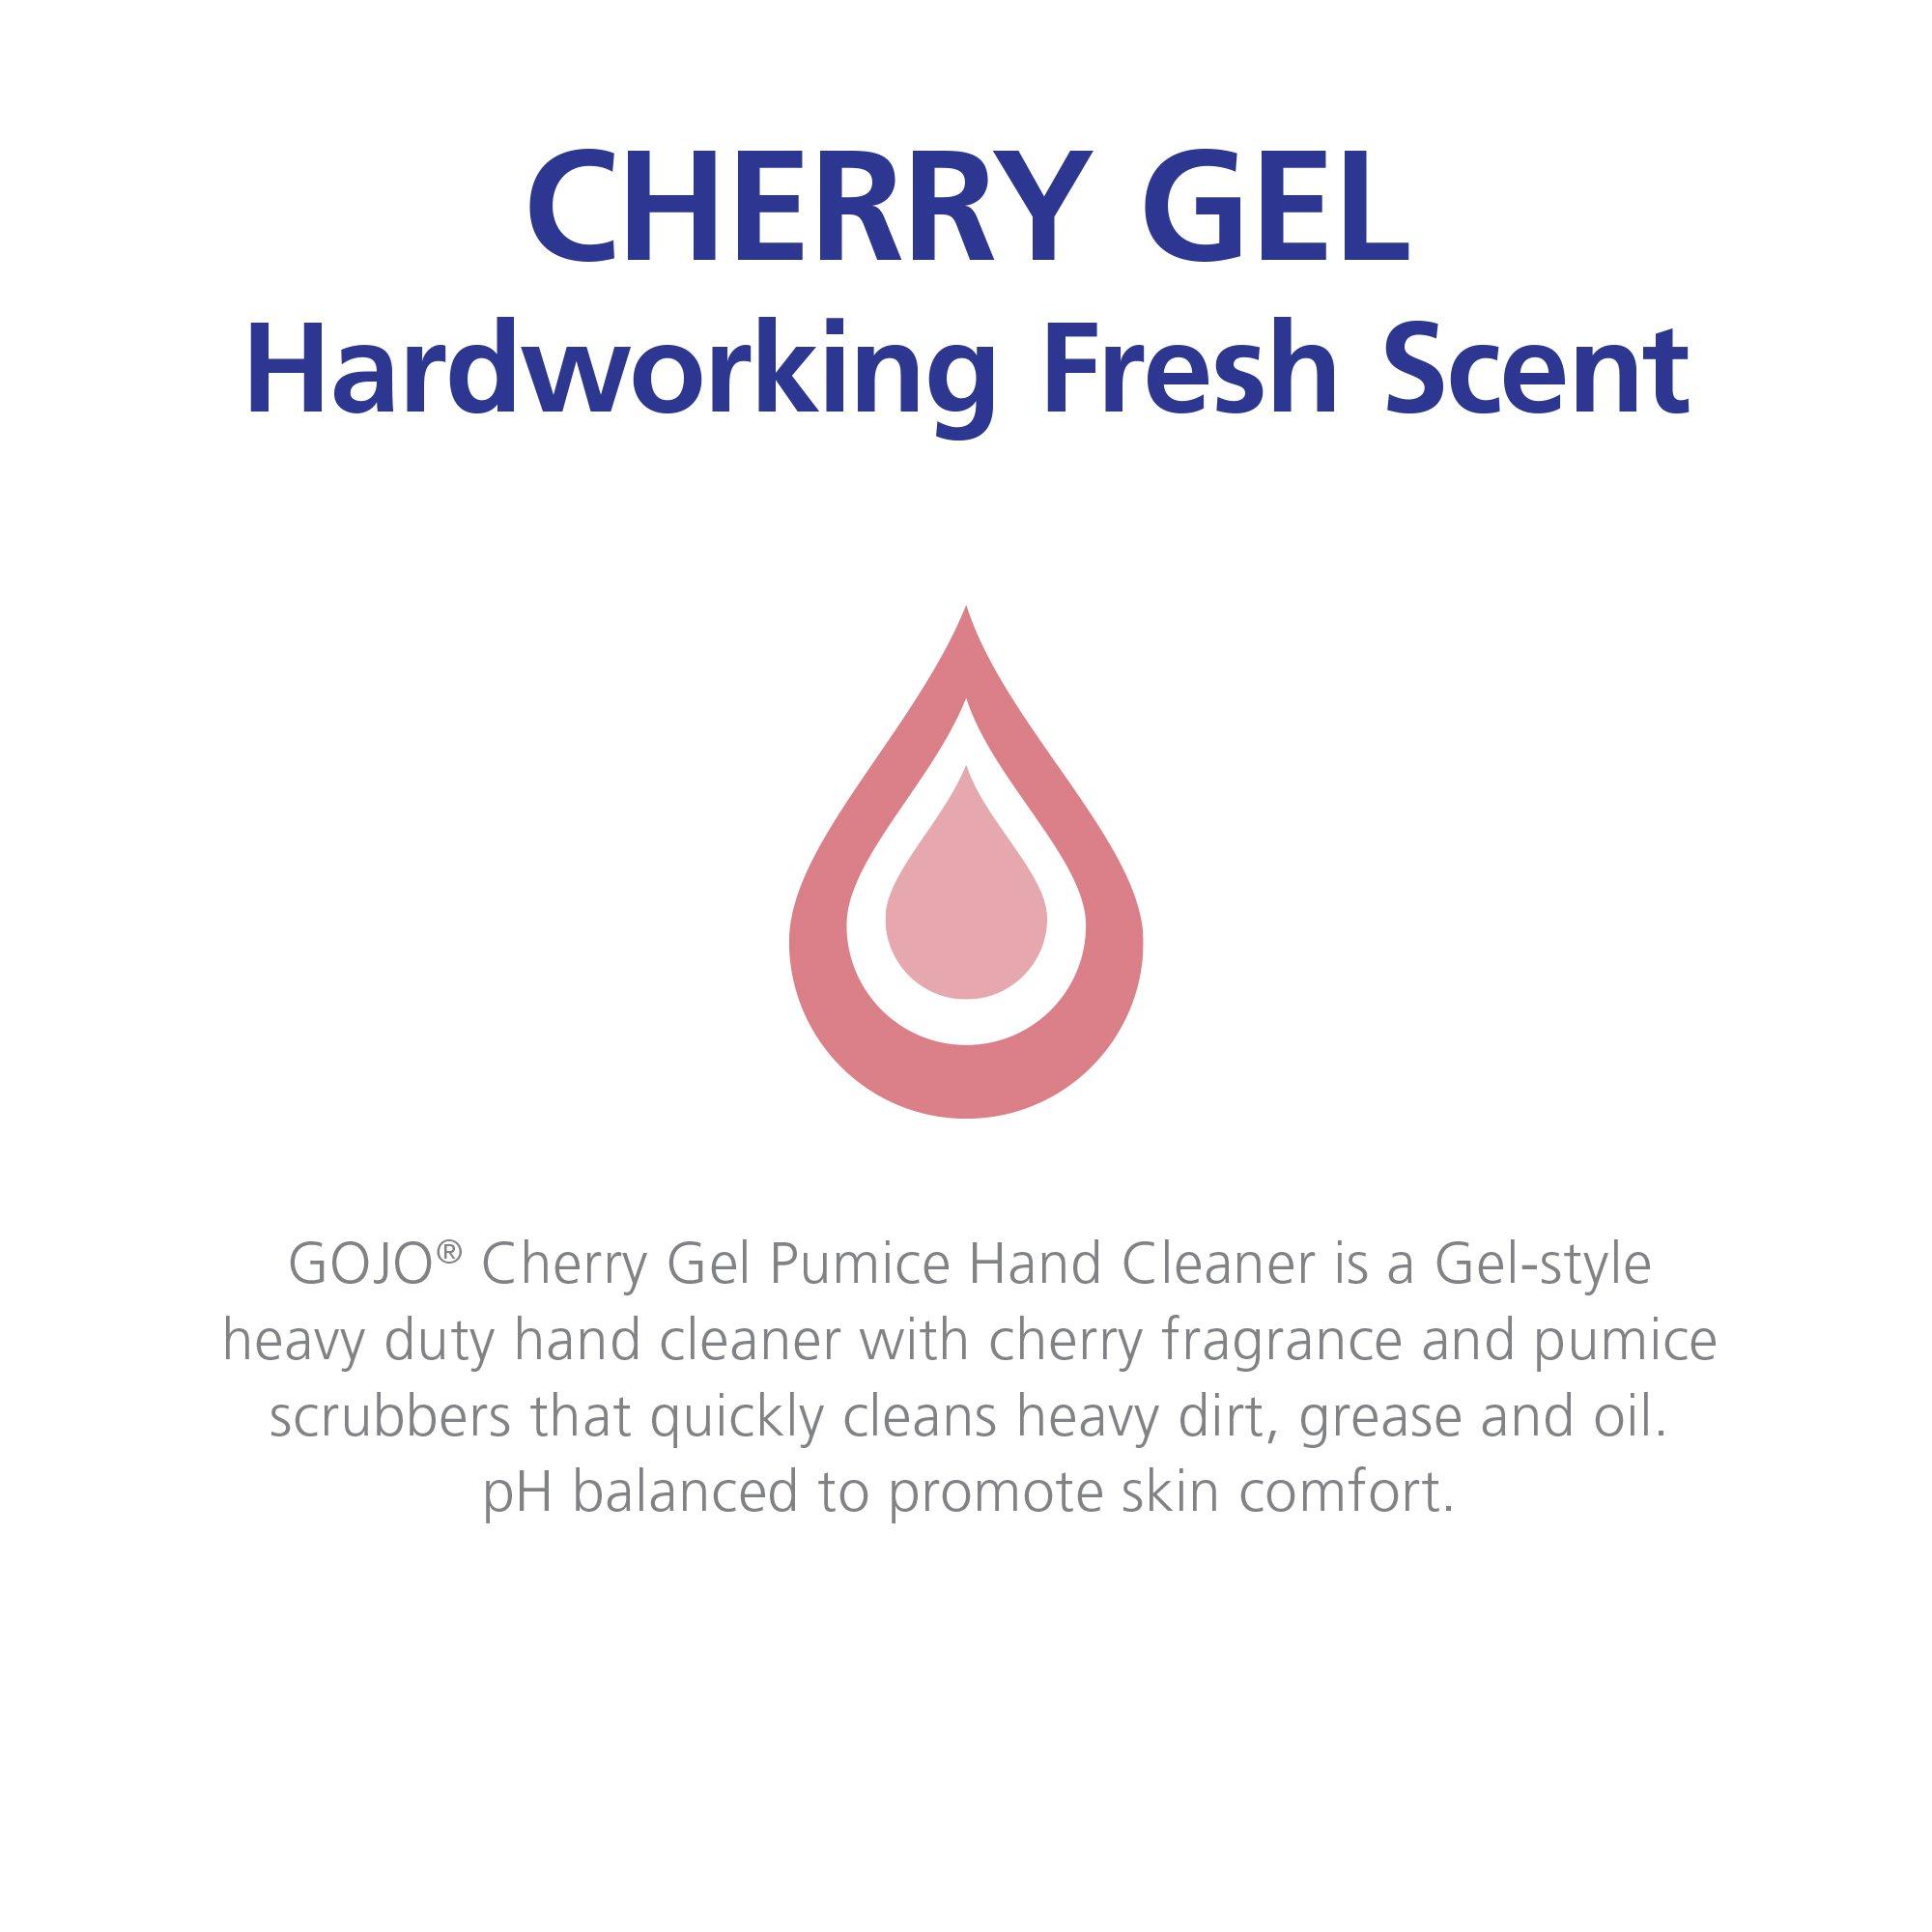 GOJO Cherry Gel Pumice Hand Cleaner, Cherry Fragrance, PRO TDX Starter Kit, 1-2000 mL Hand Cleaner Refill + 1 – GOJO PRO TDX Push Style Dispenser - 7290-D2 by Gojo (Image #3)